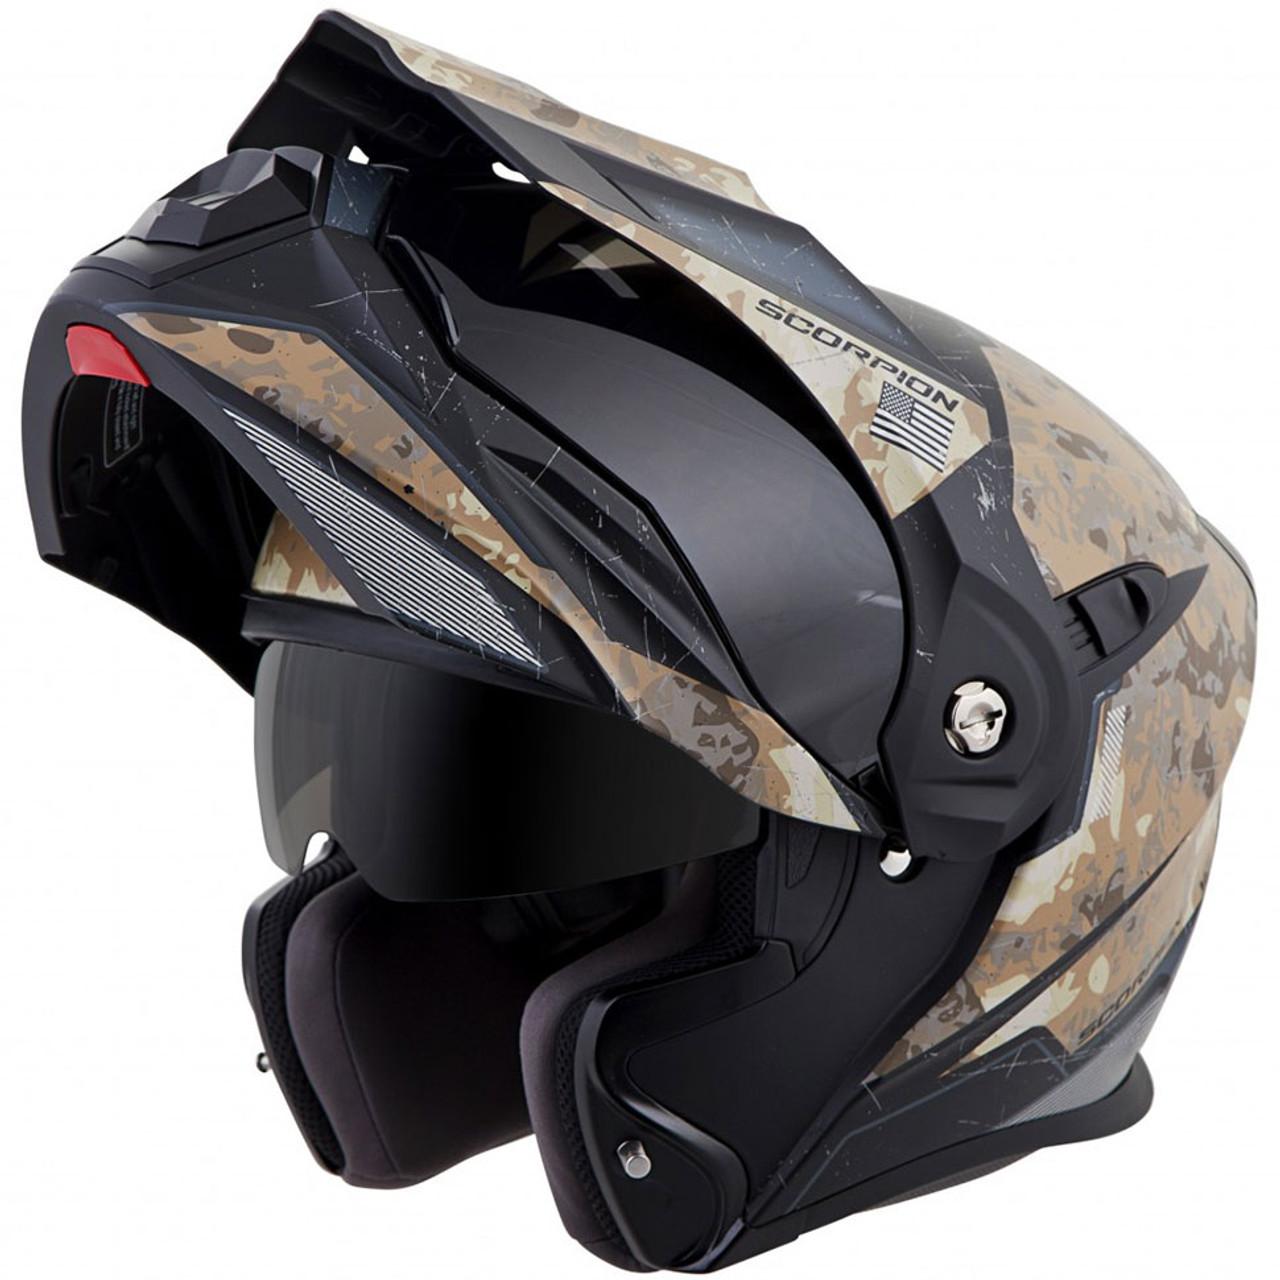 scorpion exo at950 battleflage modular motorcycle helmet. Black Bedroom Furniture Sets. Home Design Ideas